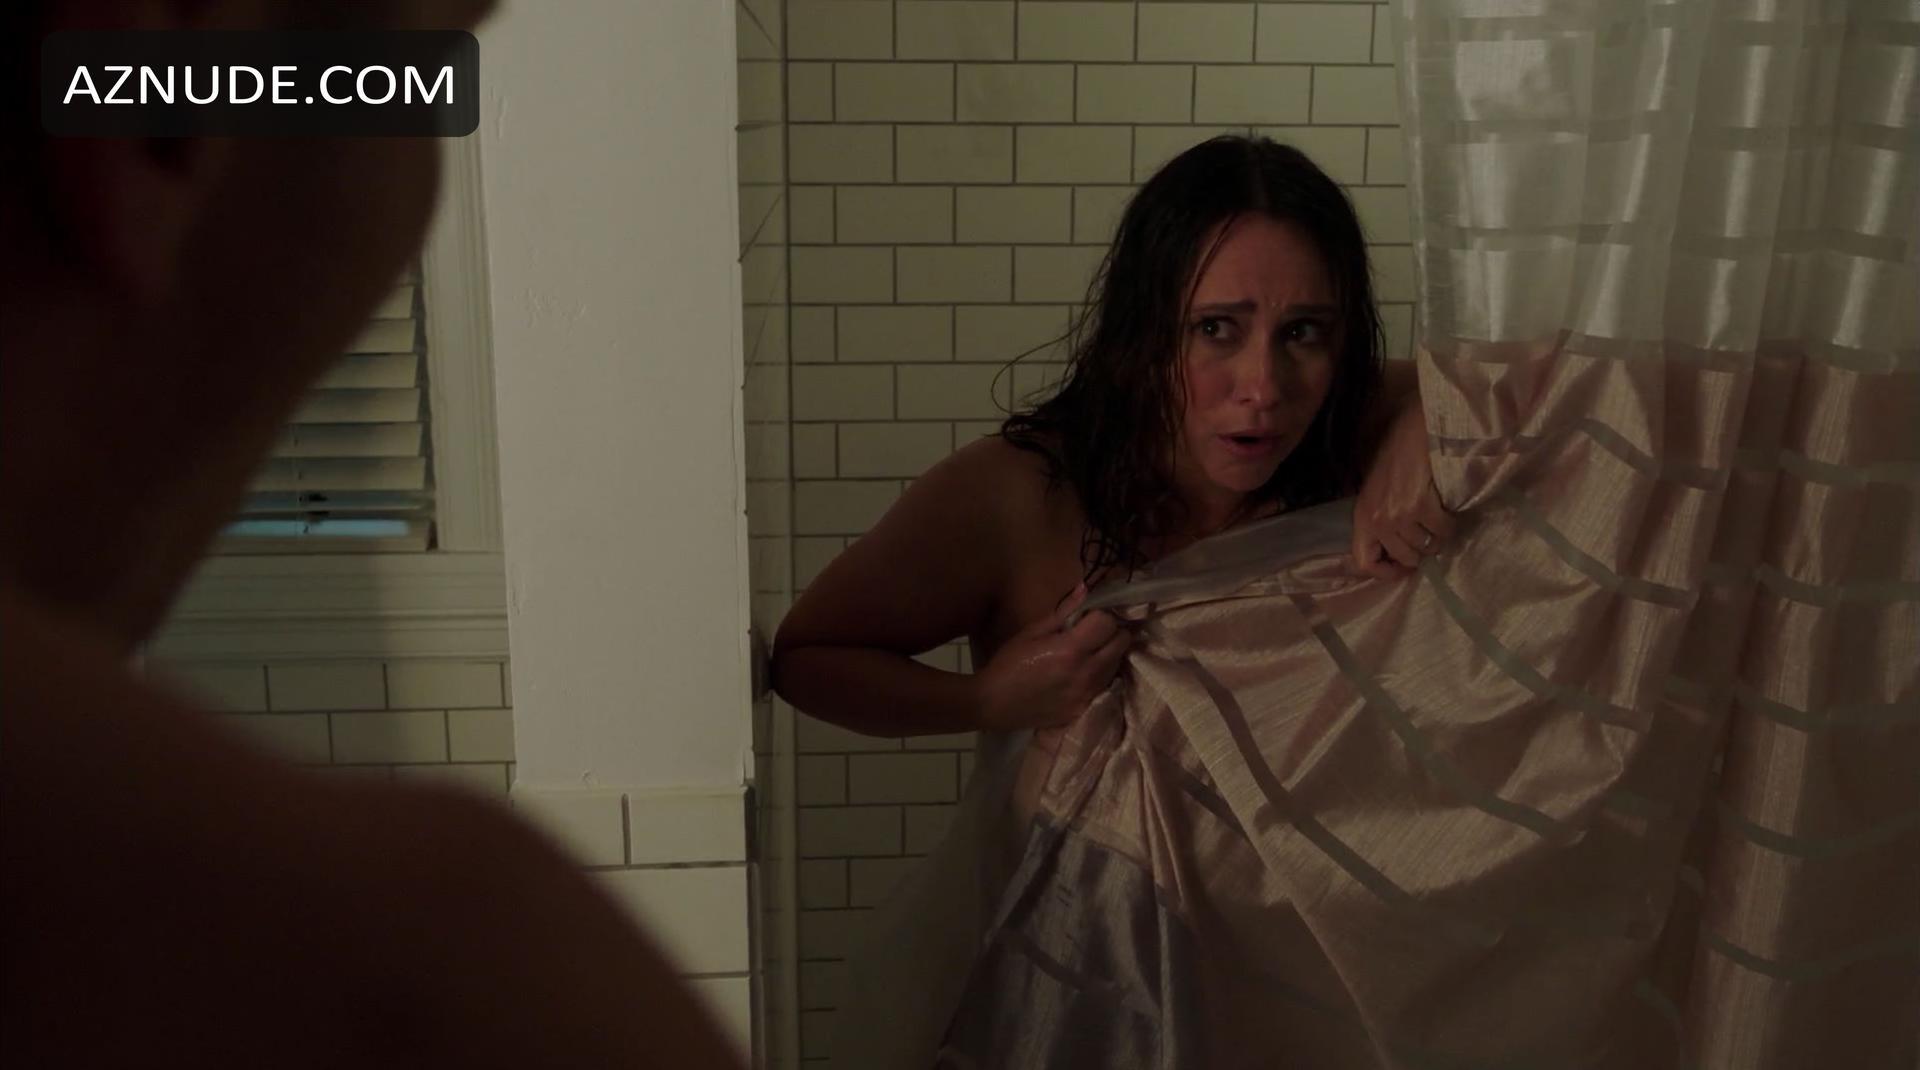 Angela Bassett Ancensored 9-1-1 nude scenes - aznude